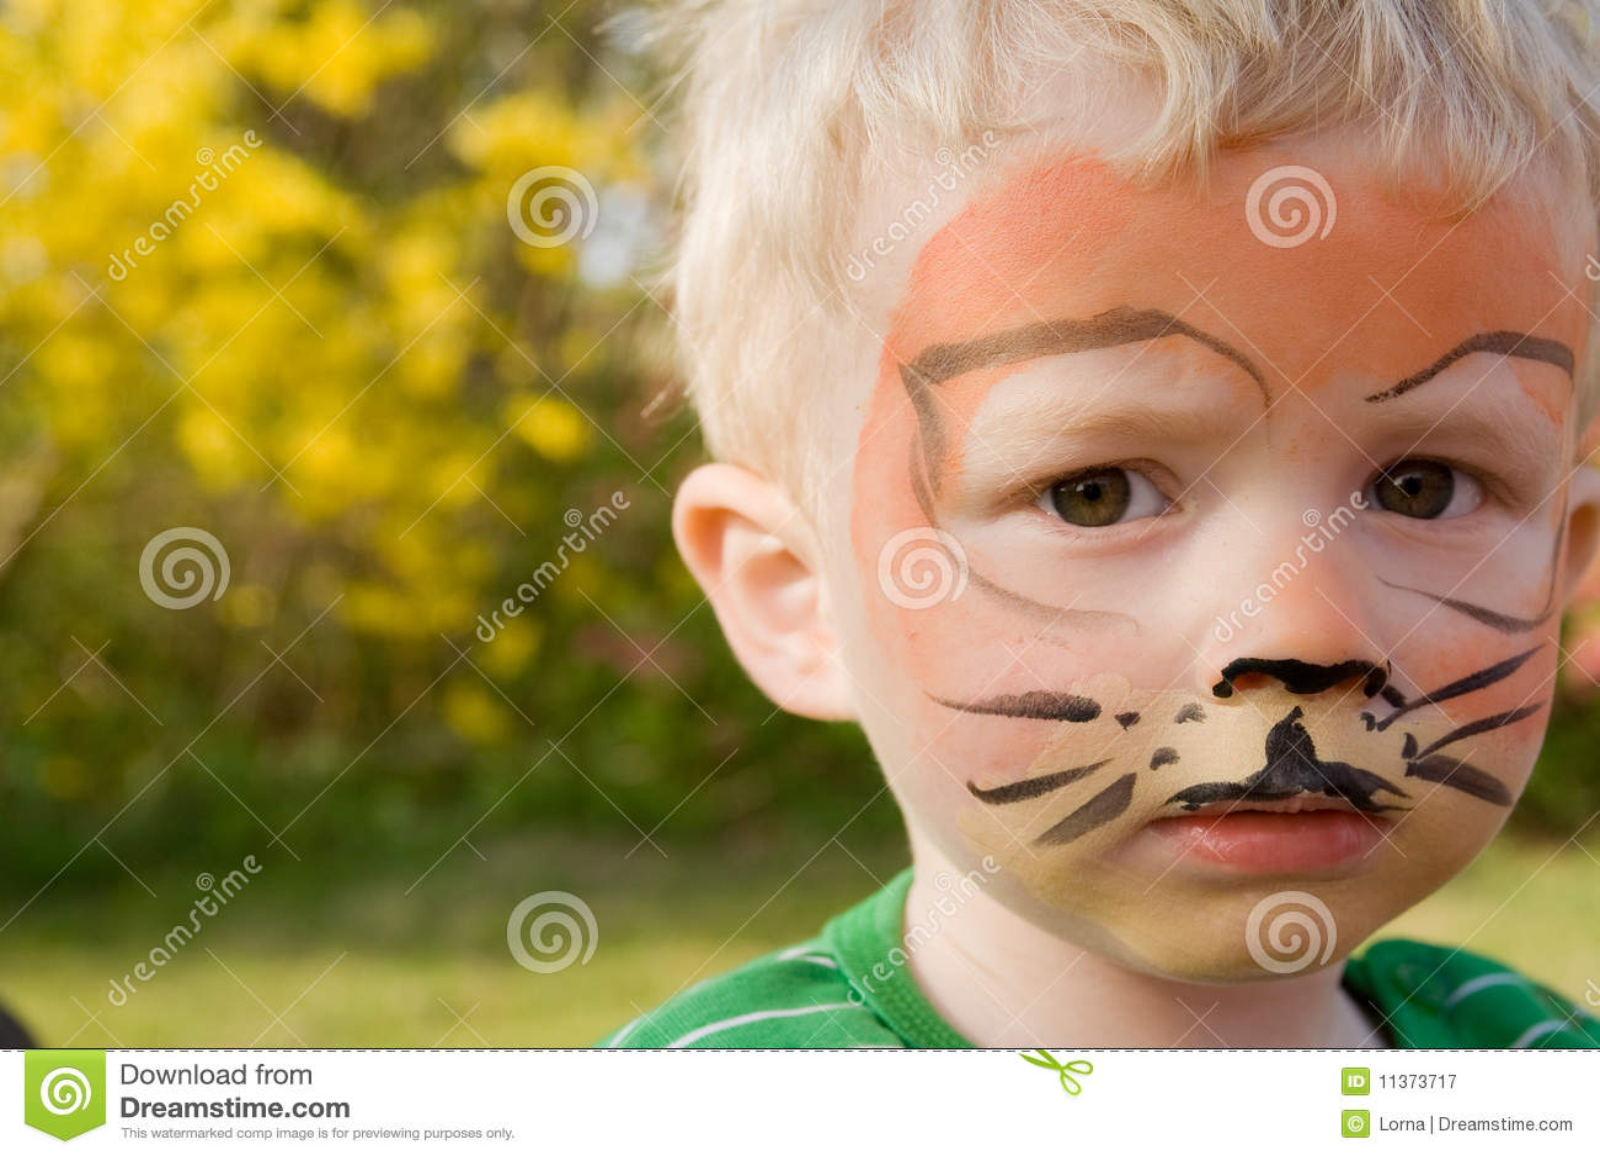 Как нарисовать тигра на лице ребенка